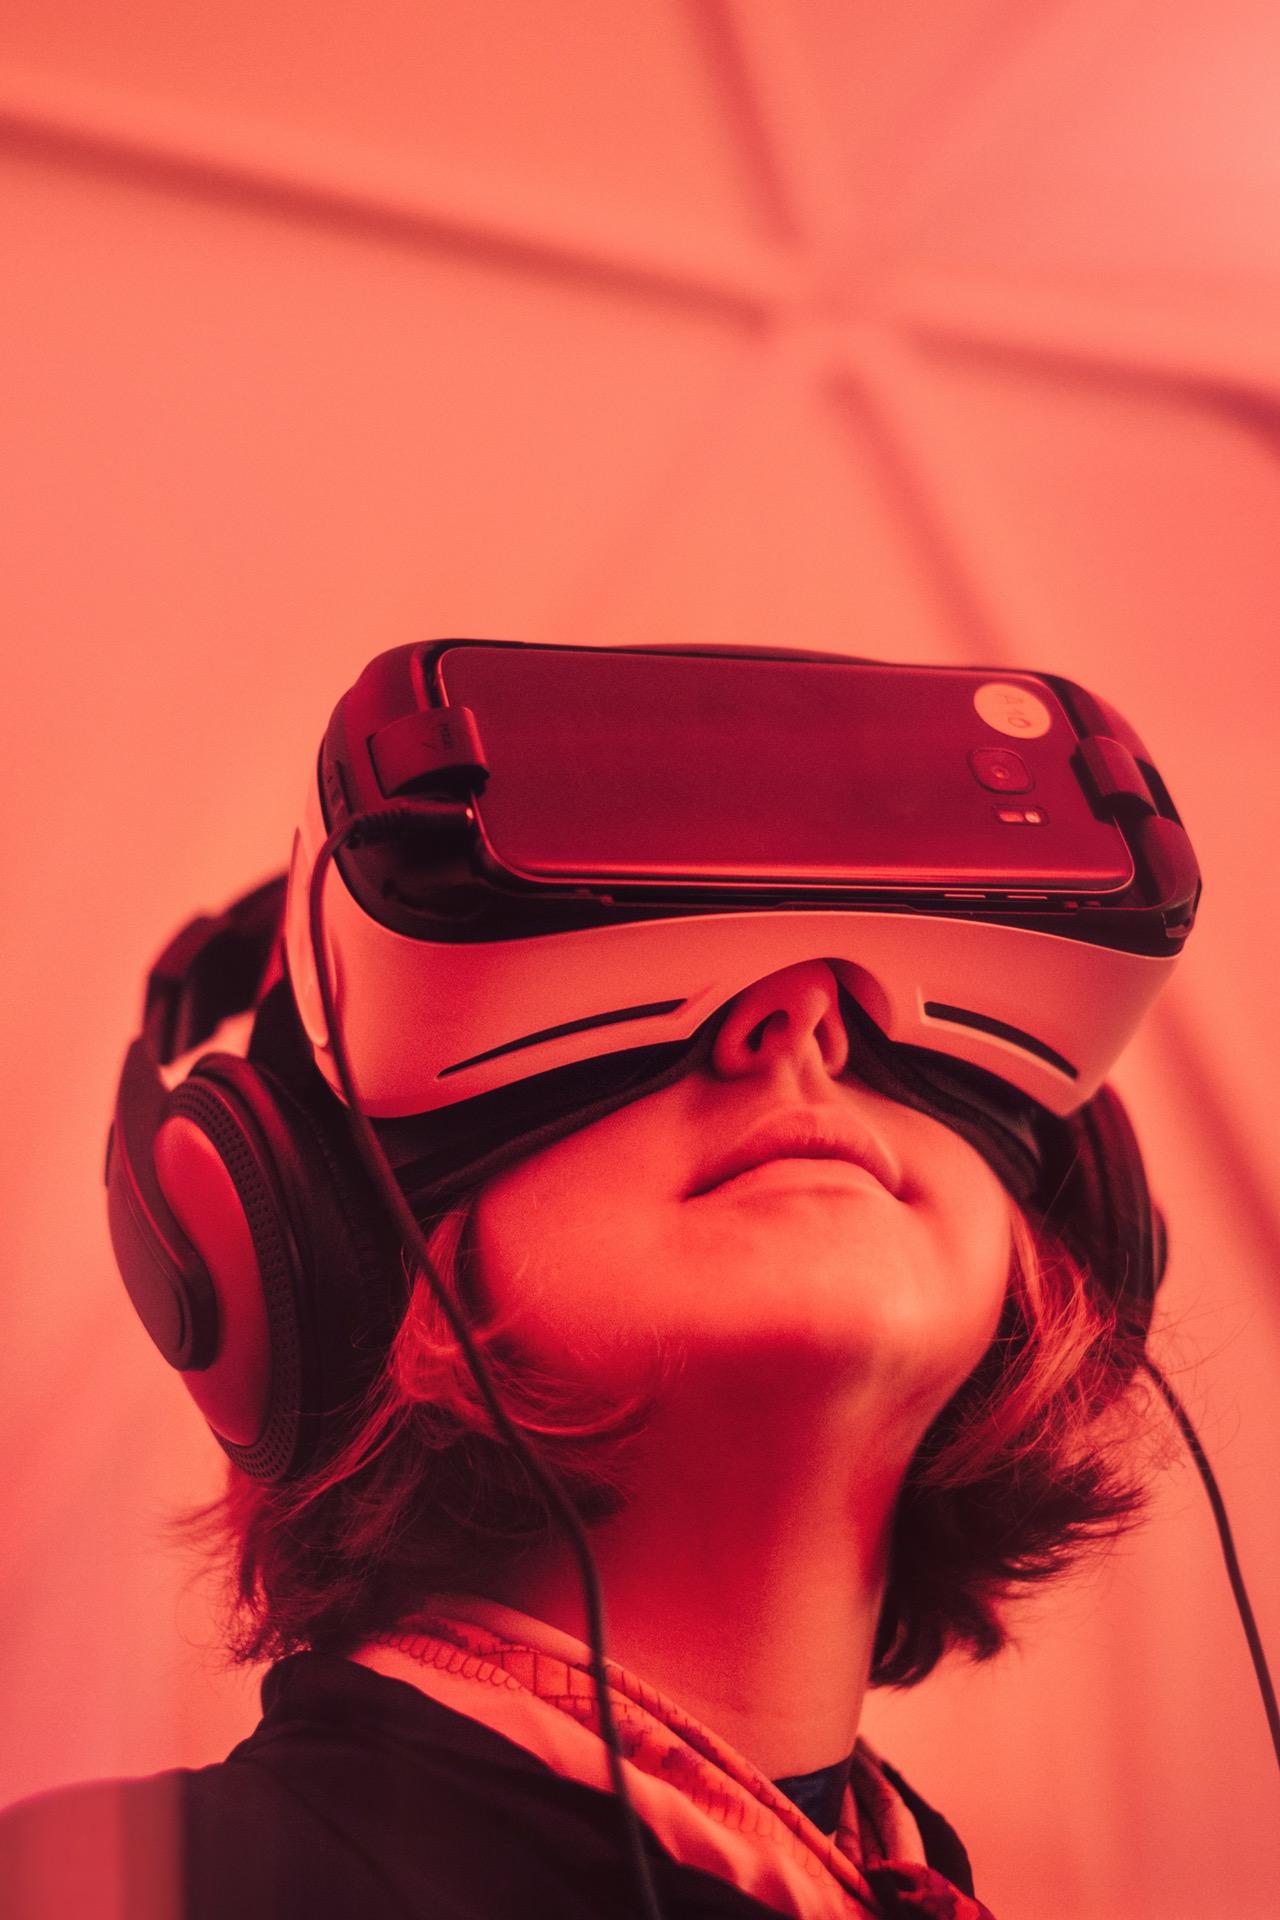 VR 360 degree video